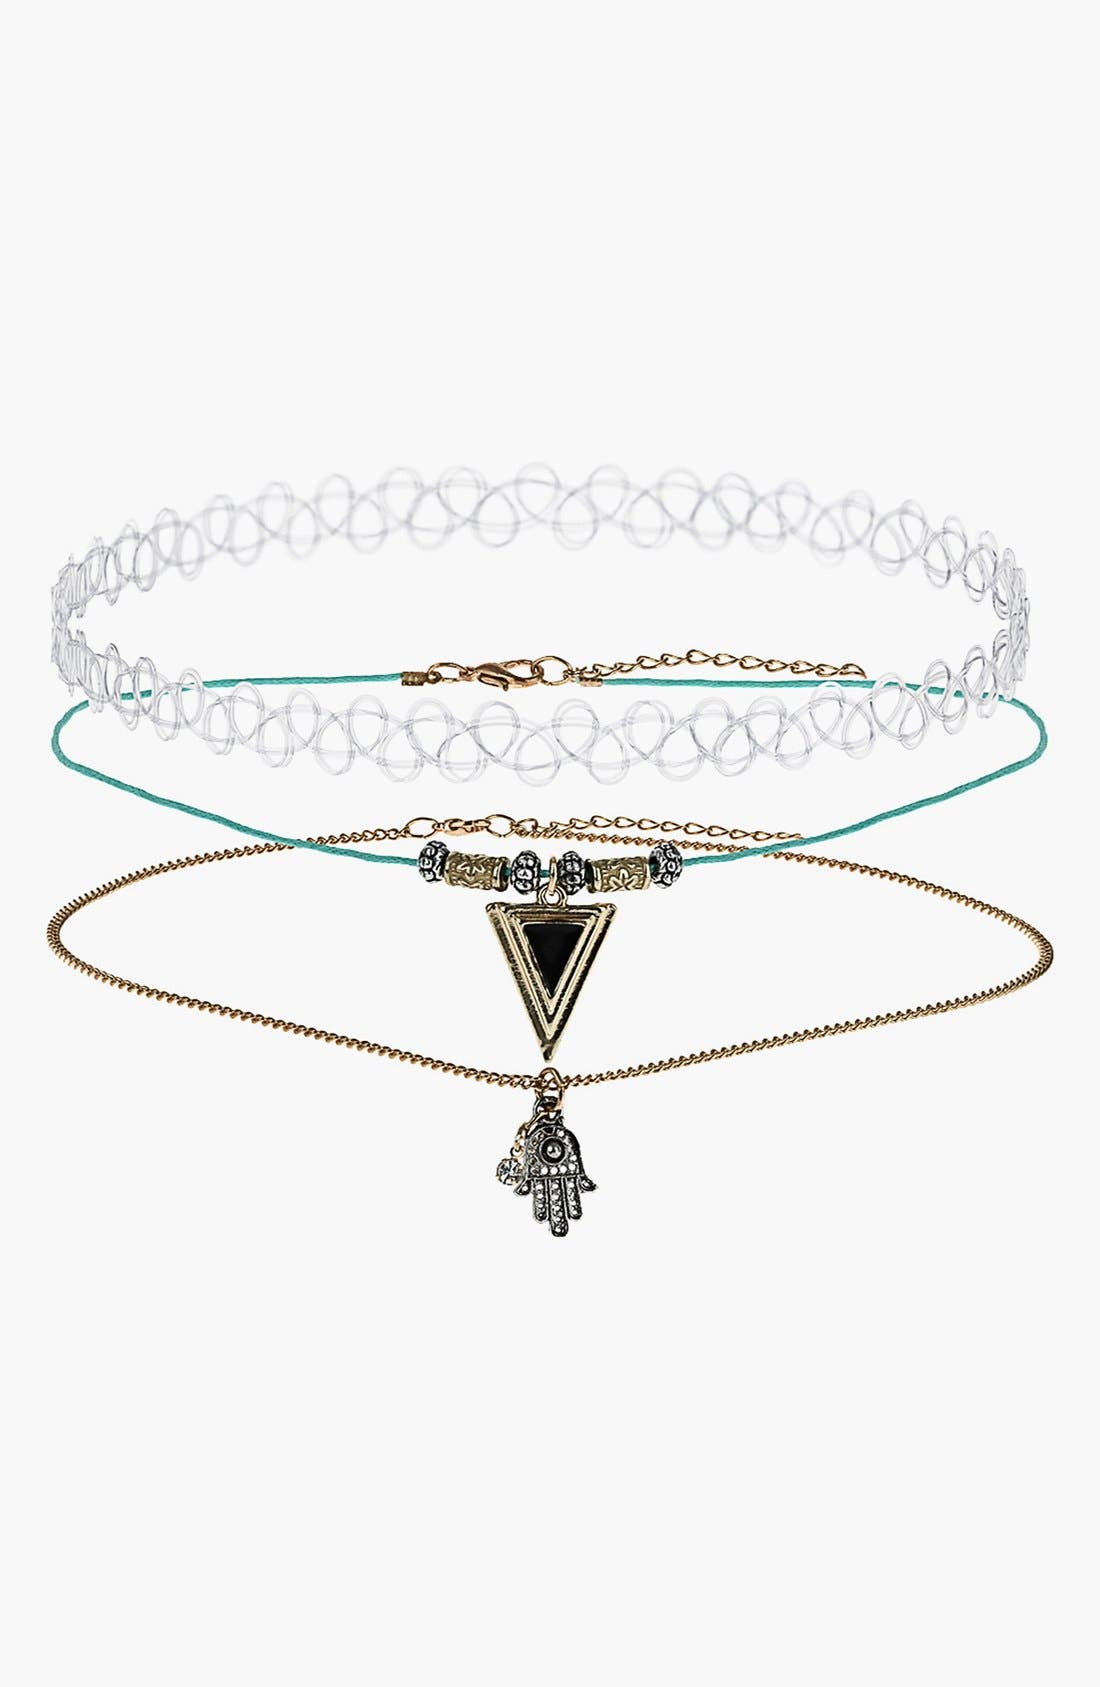 Alternate Image 1 Selected - Topshop Choker & Necklace Set